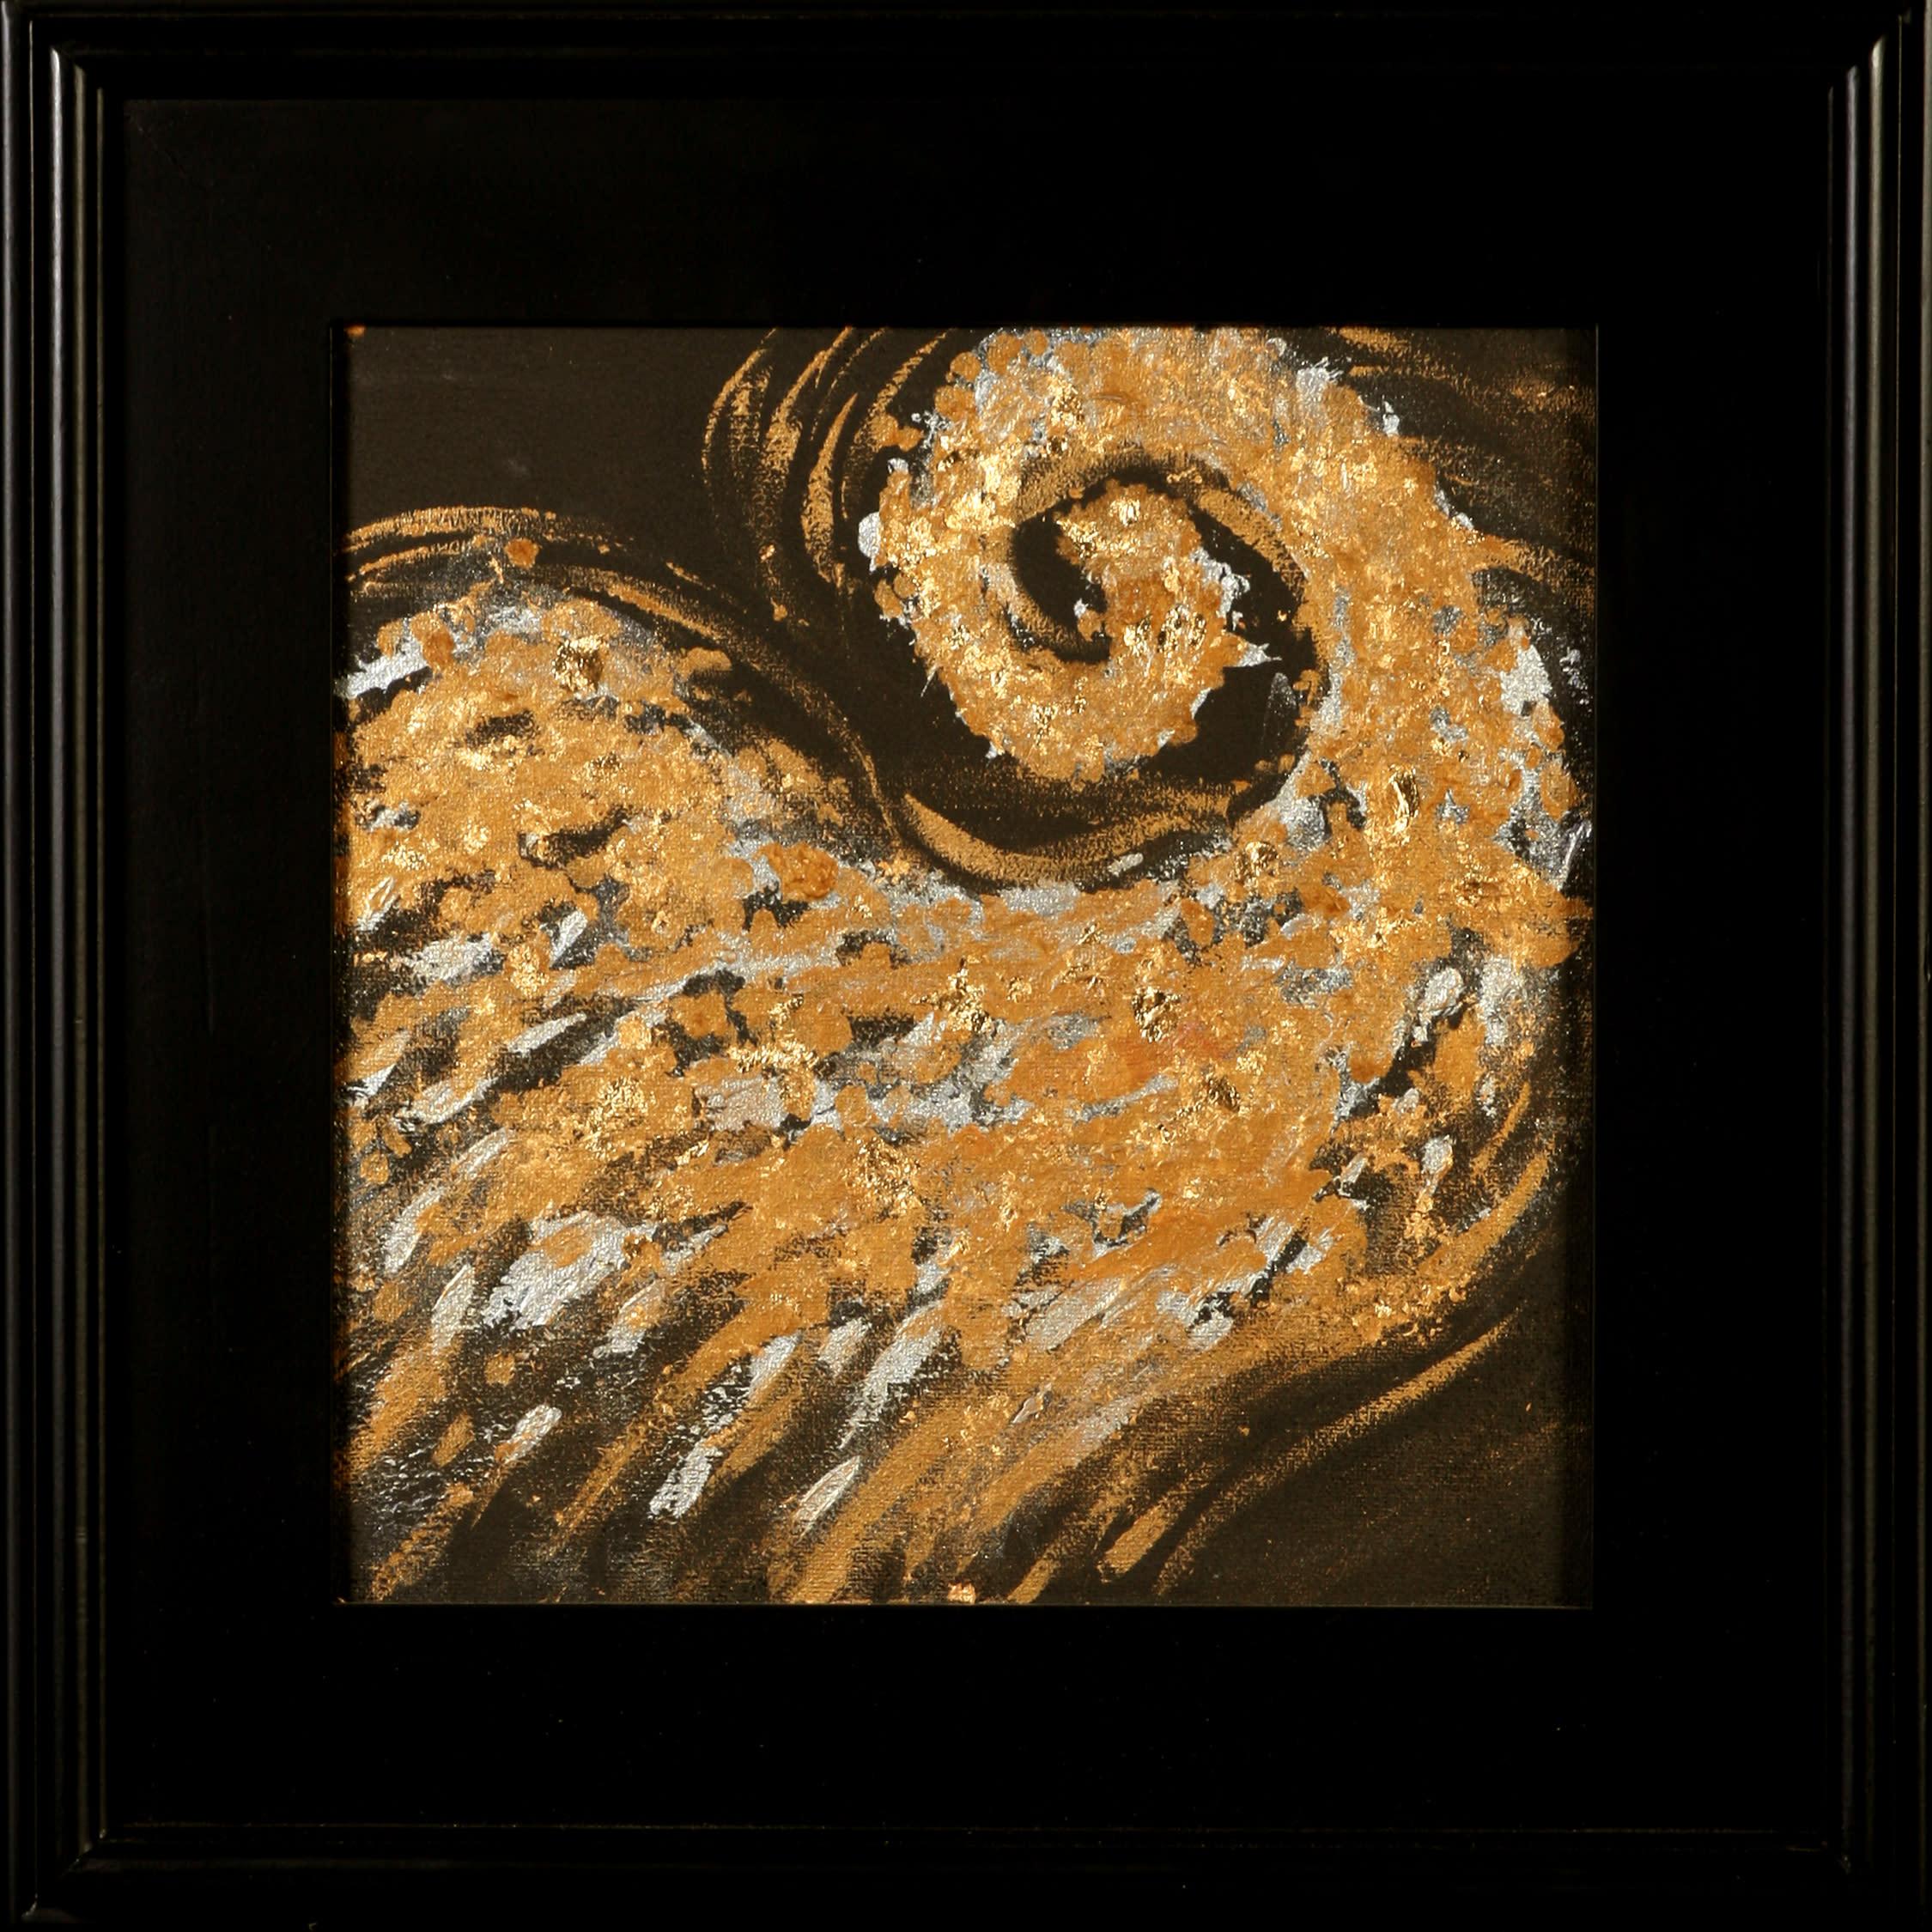 Celestial spiral vmwcue